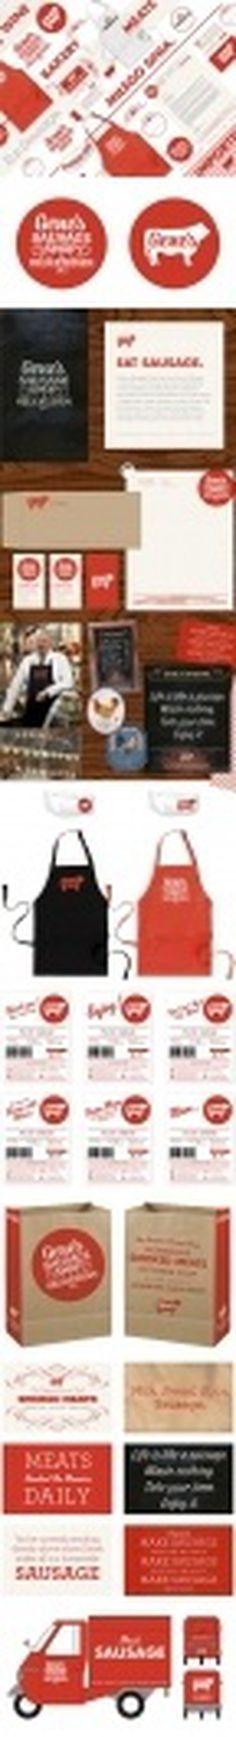 Design;Defined | www.designdefined.co.uk #food #label #brand #meat #identity #stationery #logo #knoed